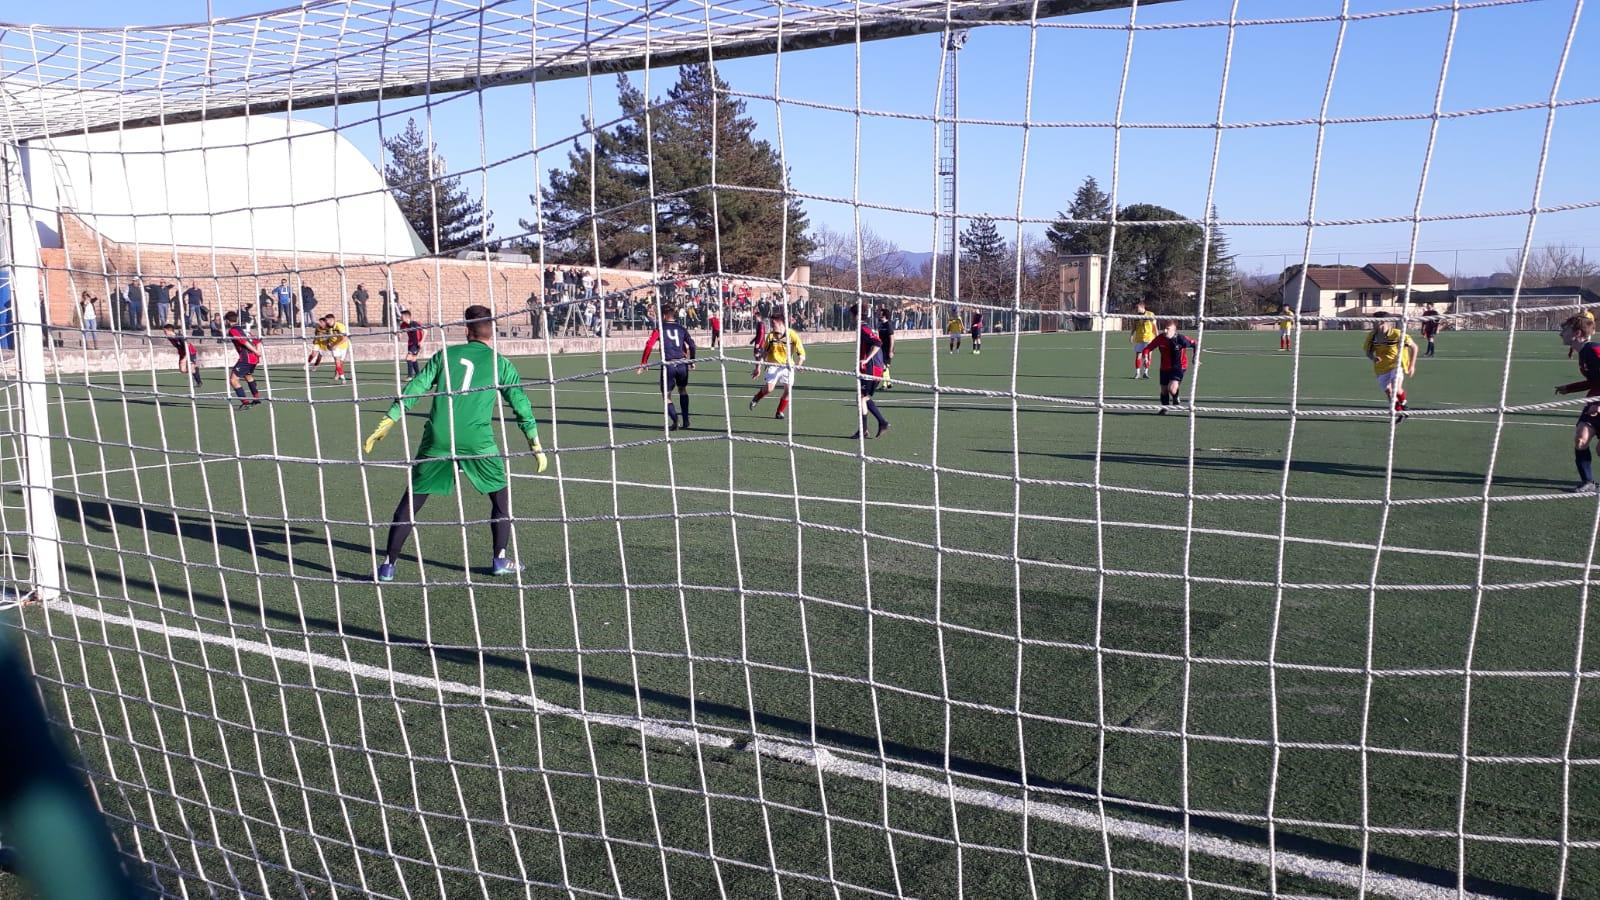 Giovanili: vittorie da alta classifica per U19 e U15